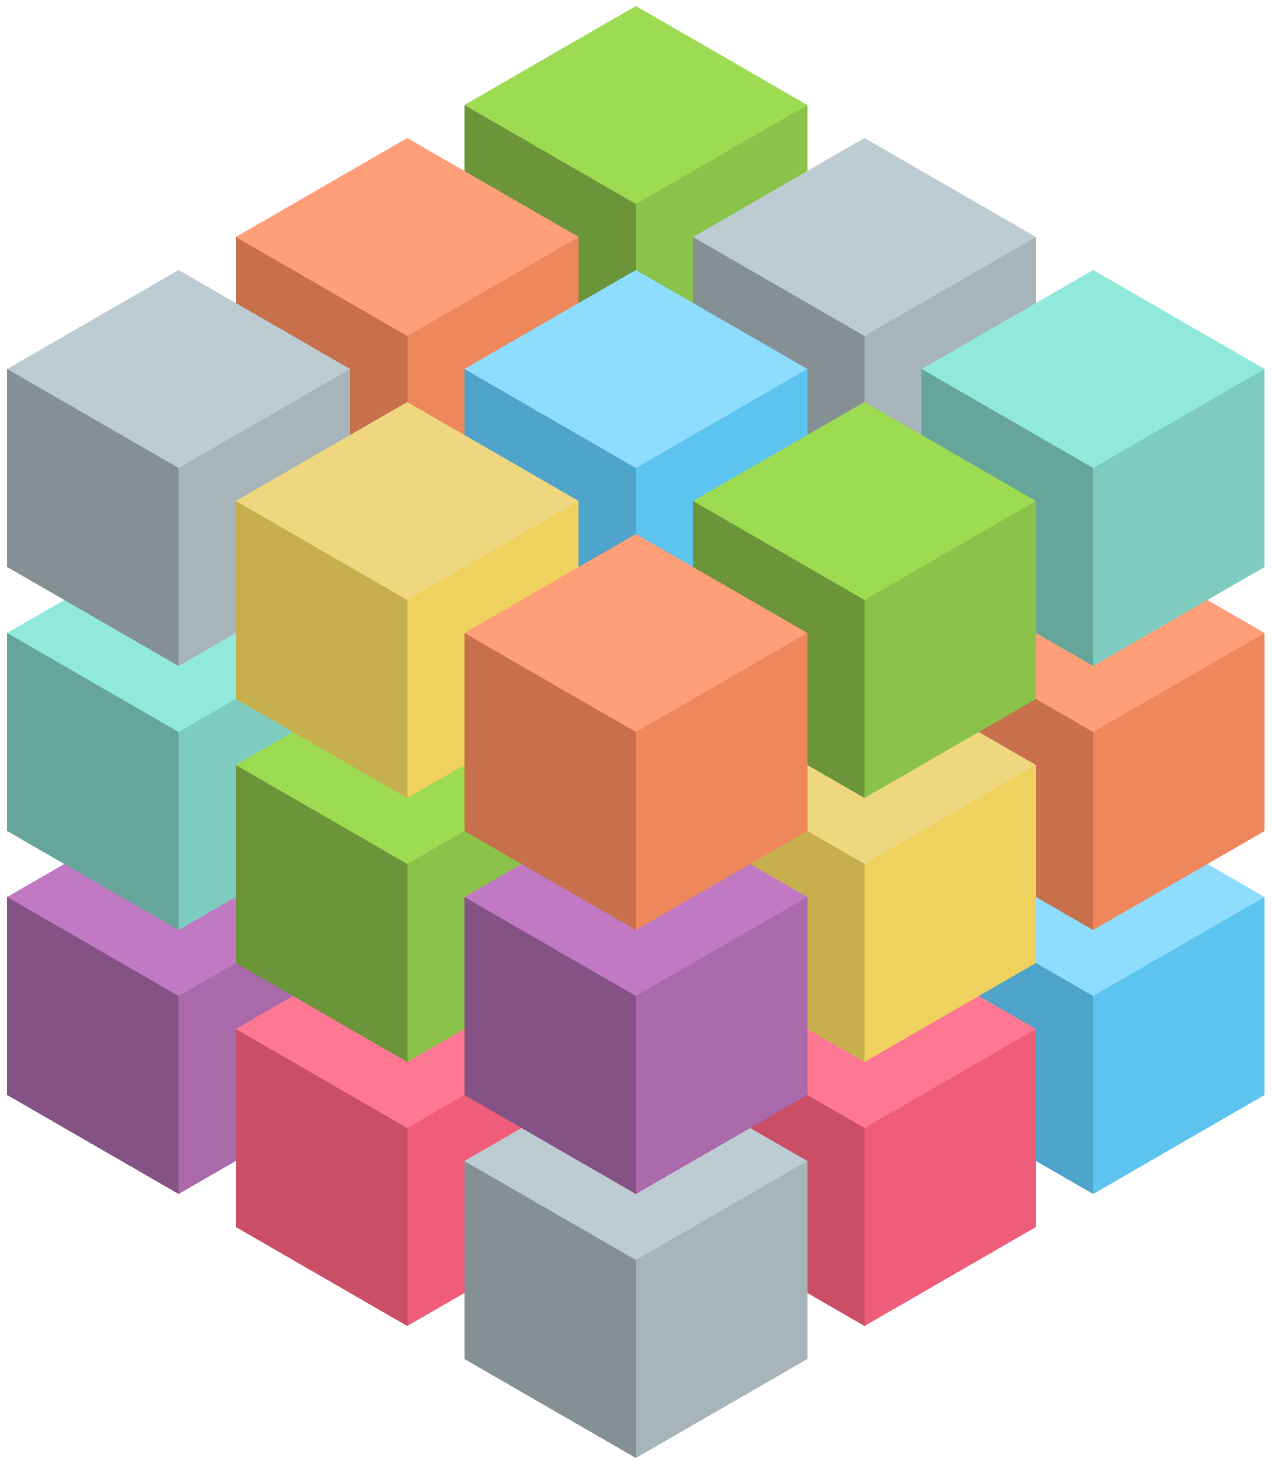 sunesis-mobile-cube